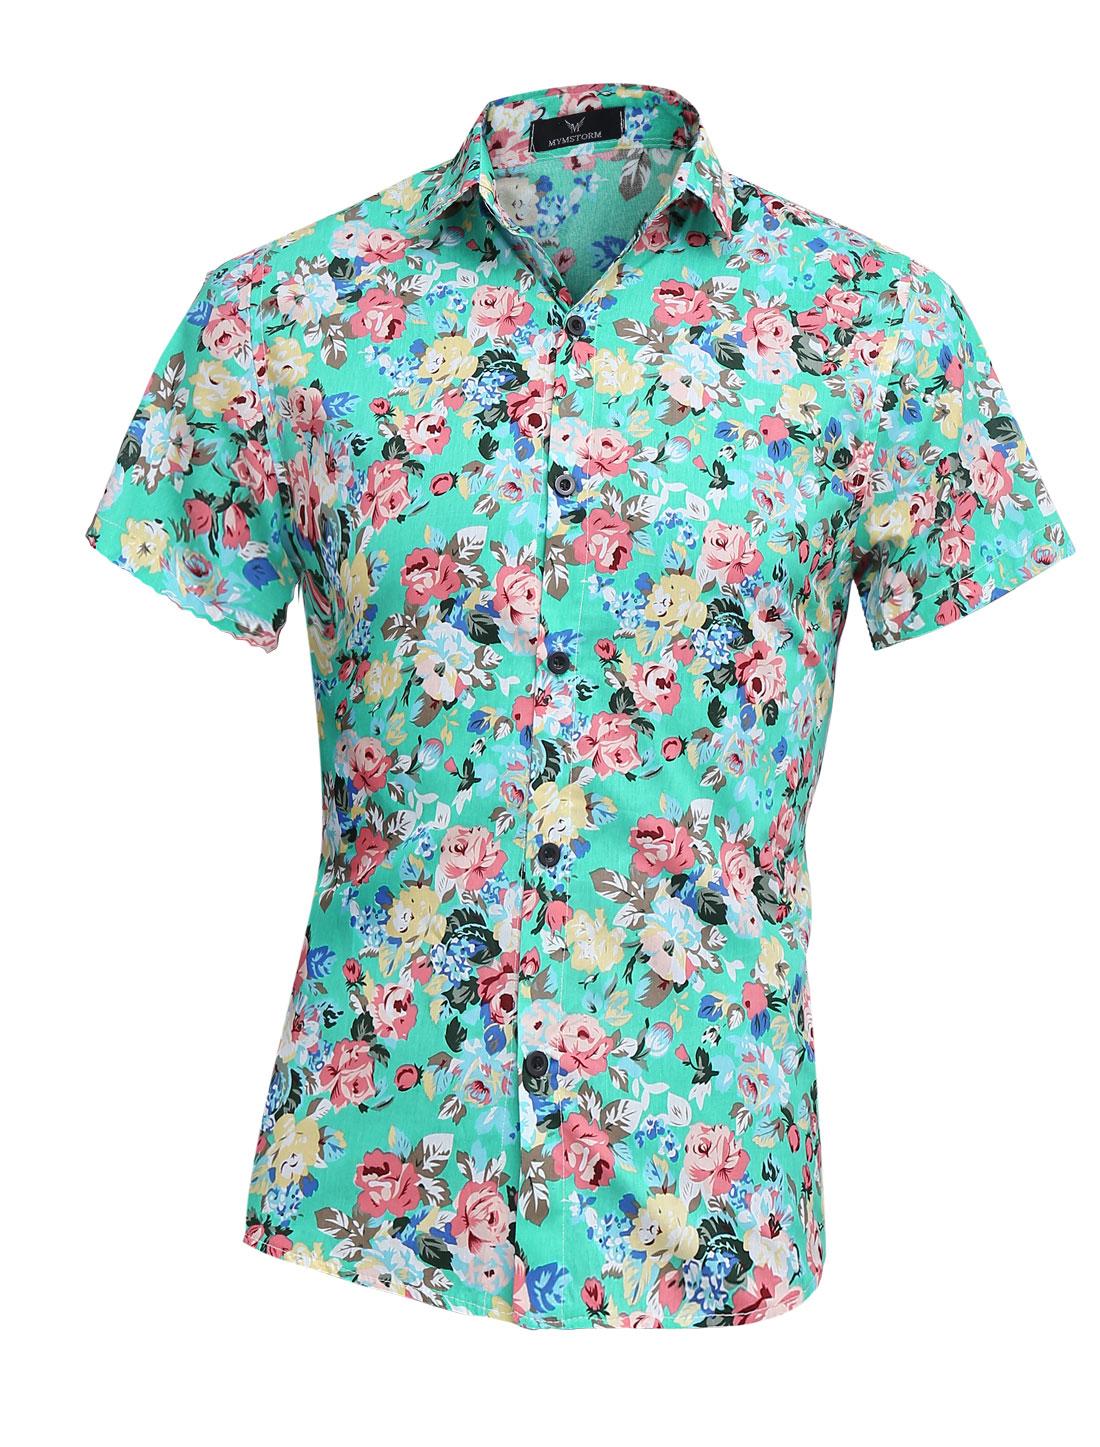 Summer Chic Buttons Up Closed Flower Pattern Shirt for Men Aqua M